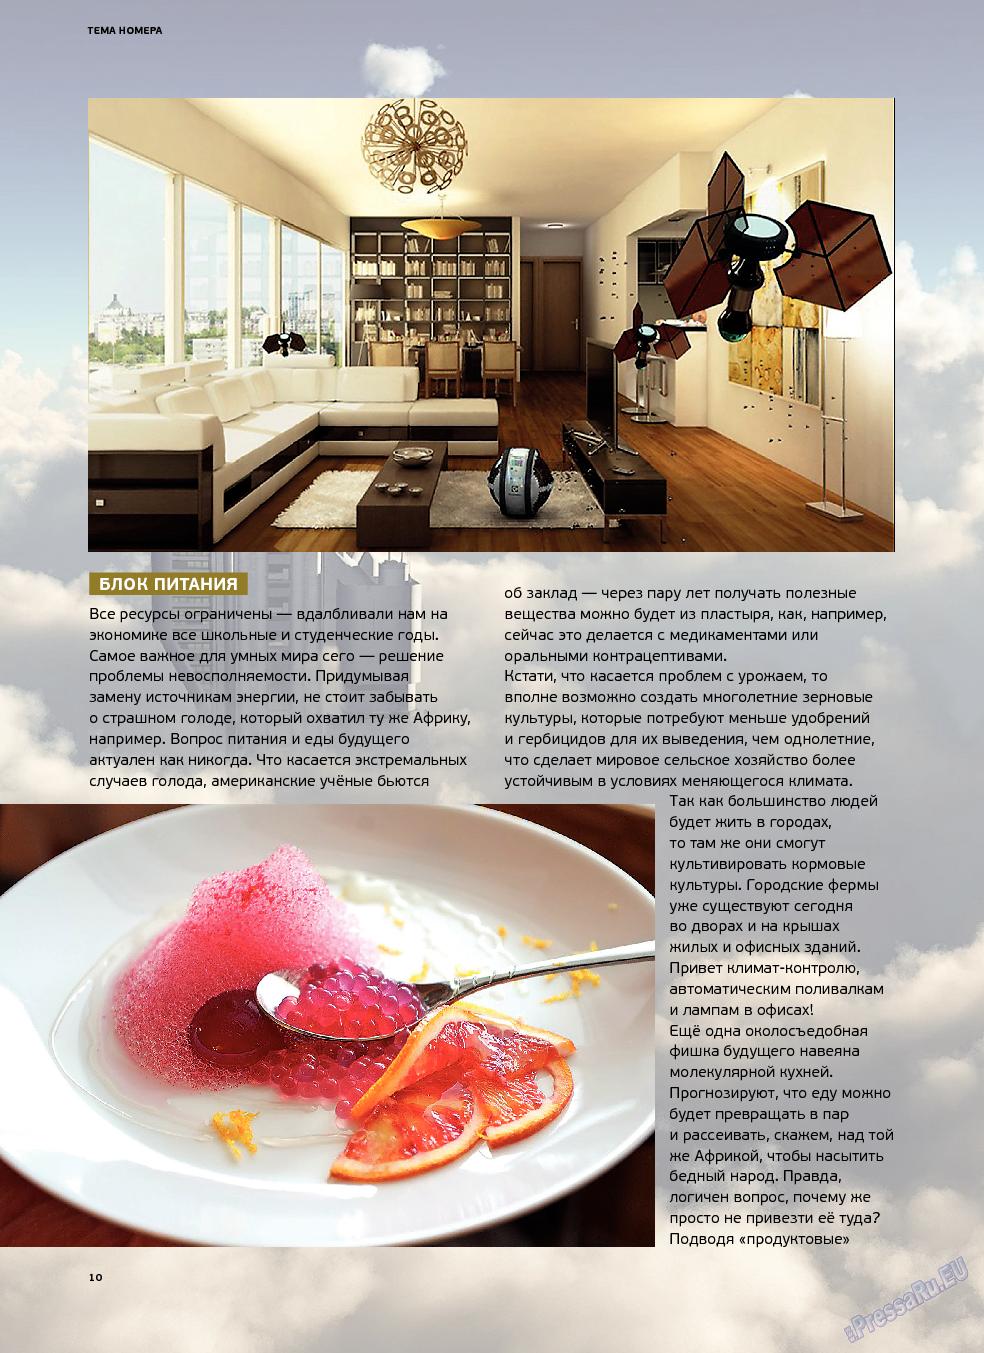 Артек (журнал). 2013 год, номер 5, стр. 12